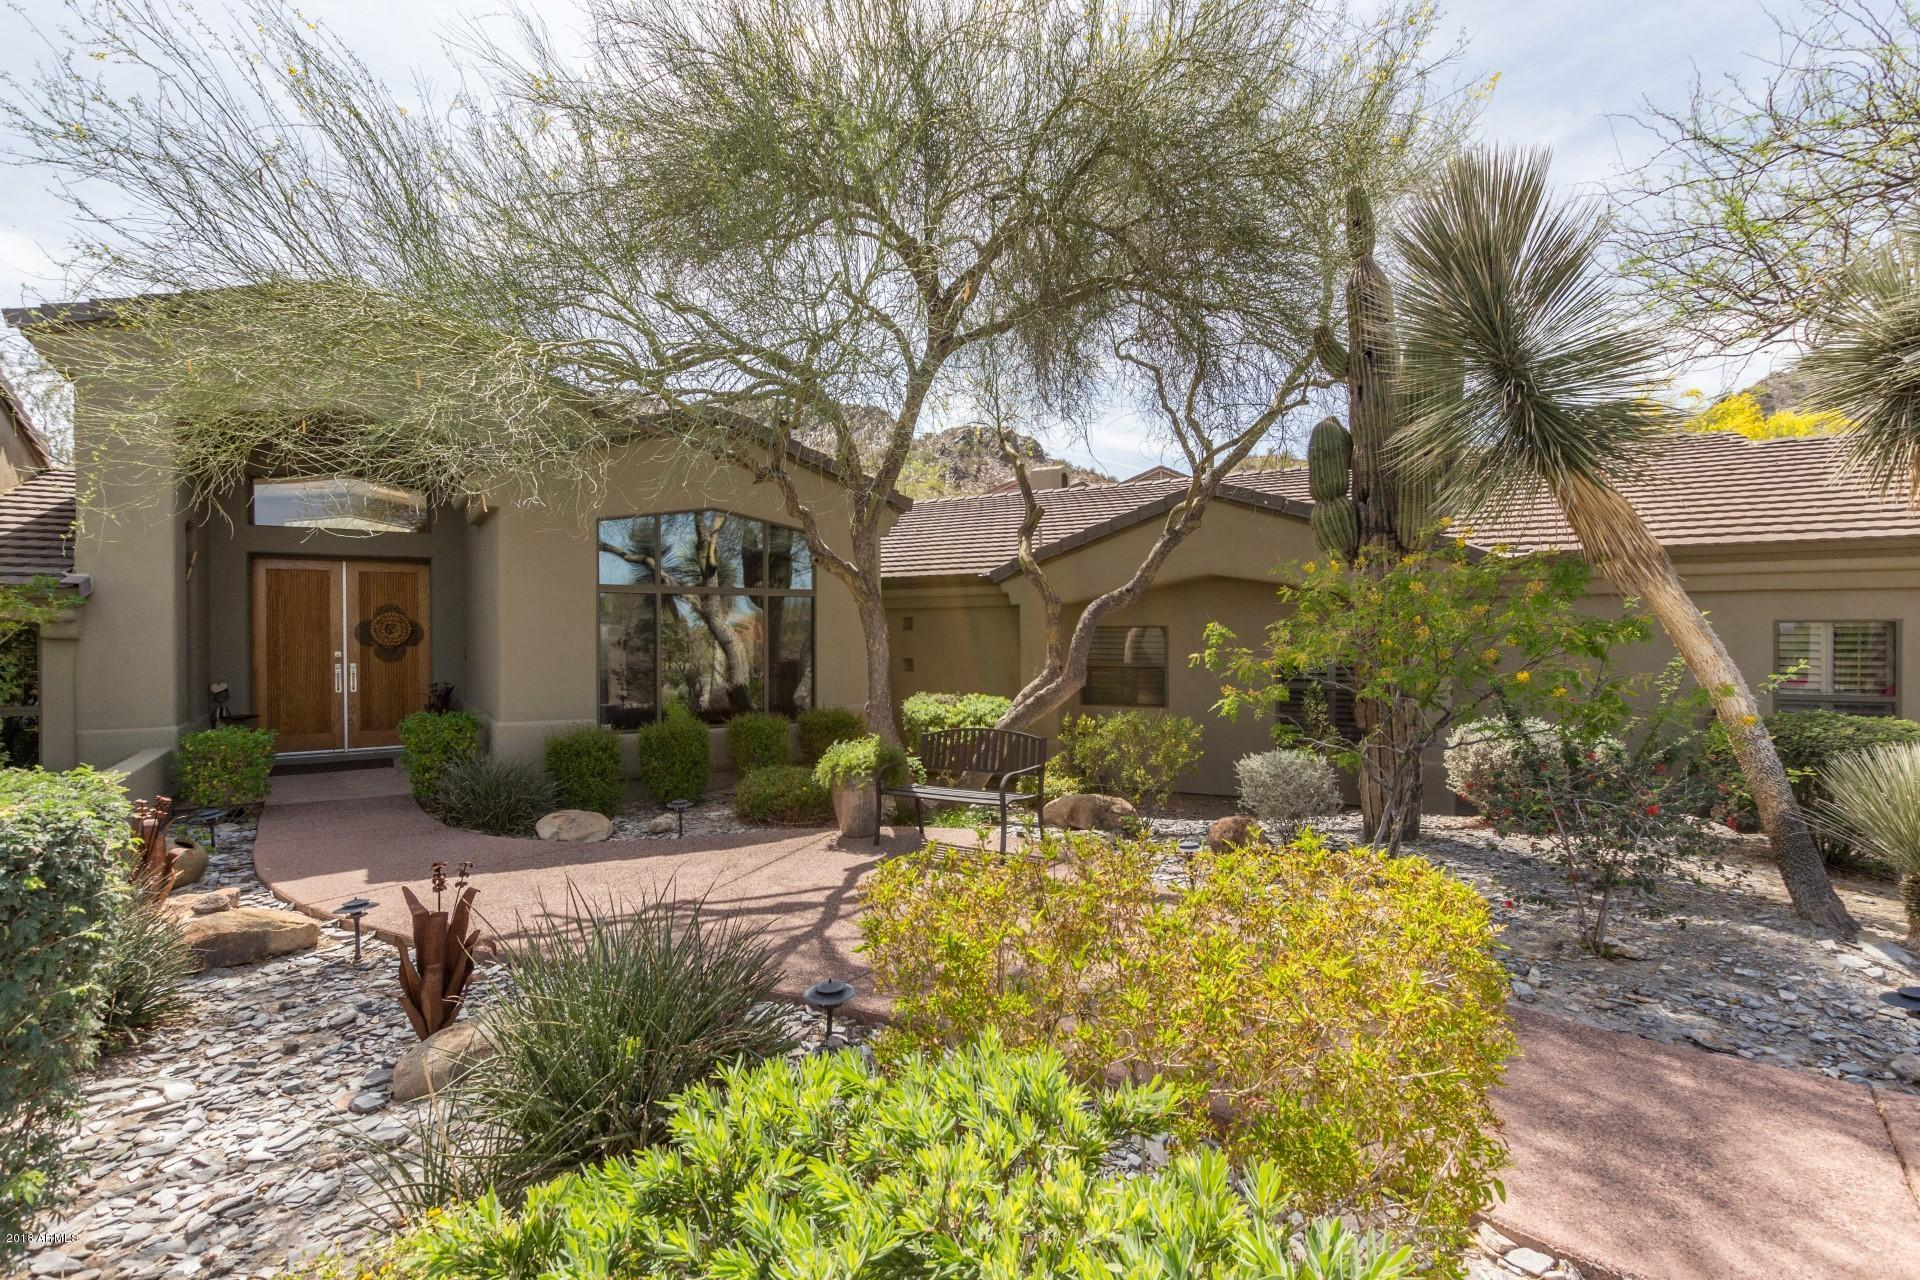 Photo of 2329 E HATCHER Road, Phoenix, AZ 85028